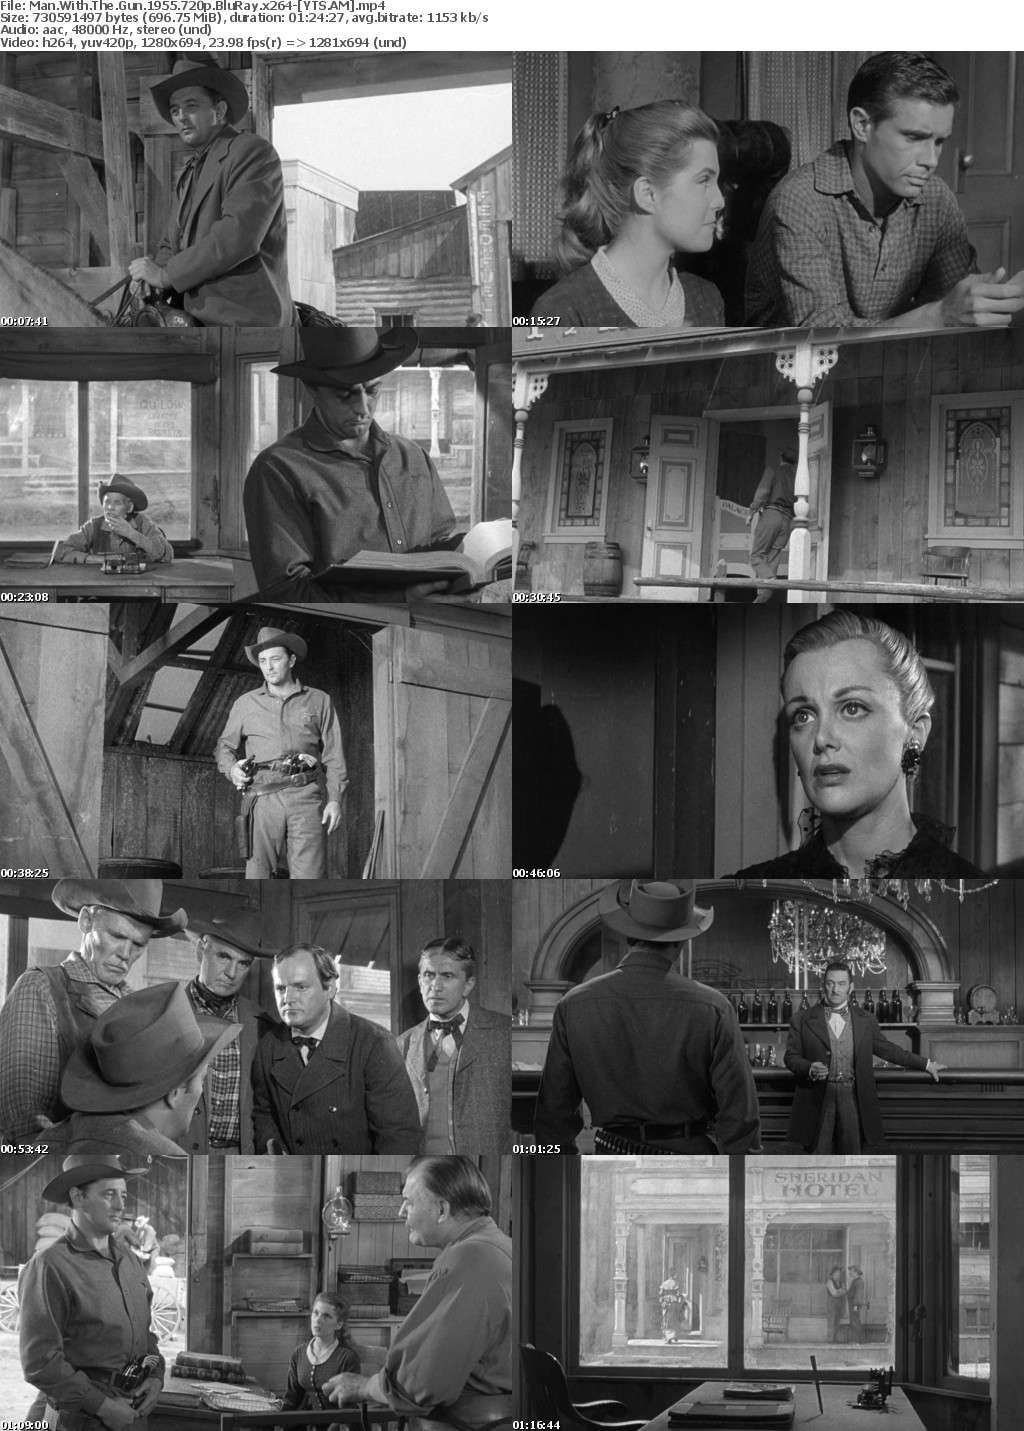 Man with the Gun (1955) [BluRay] [720p] YIFY